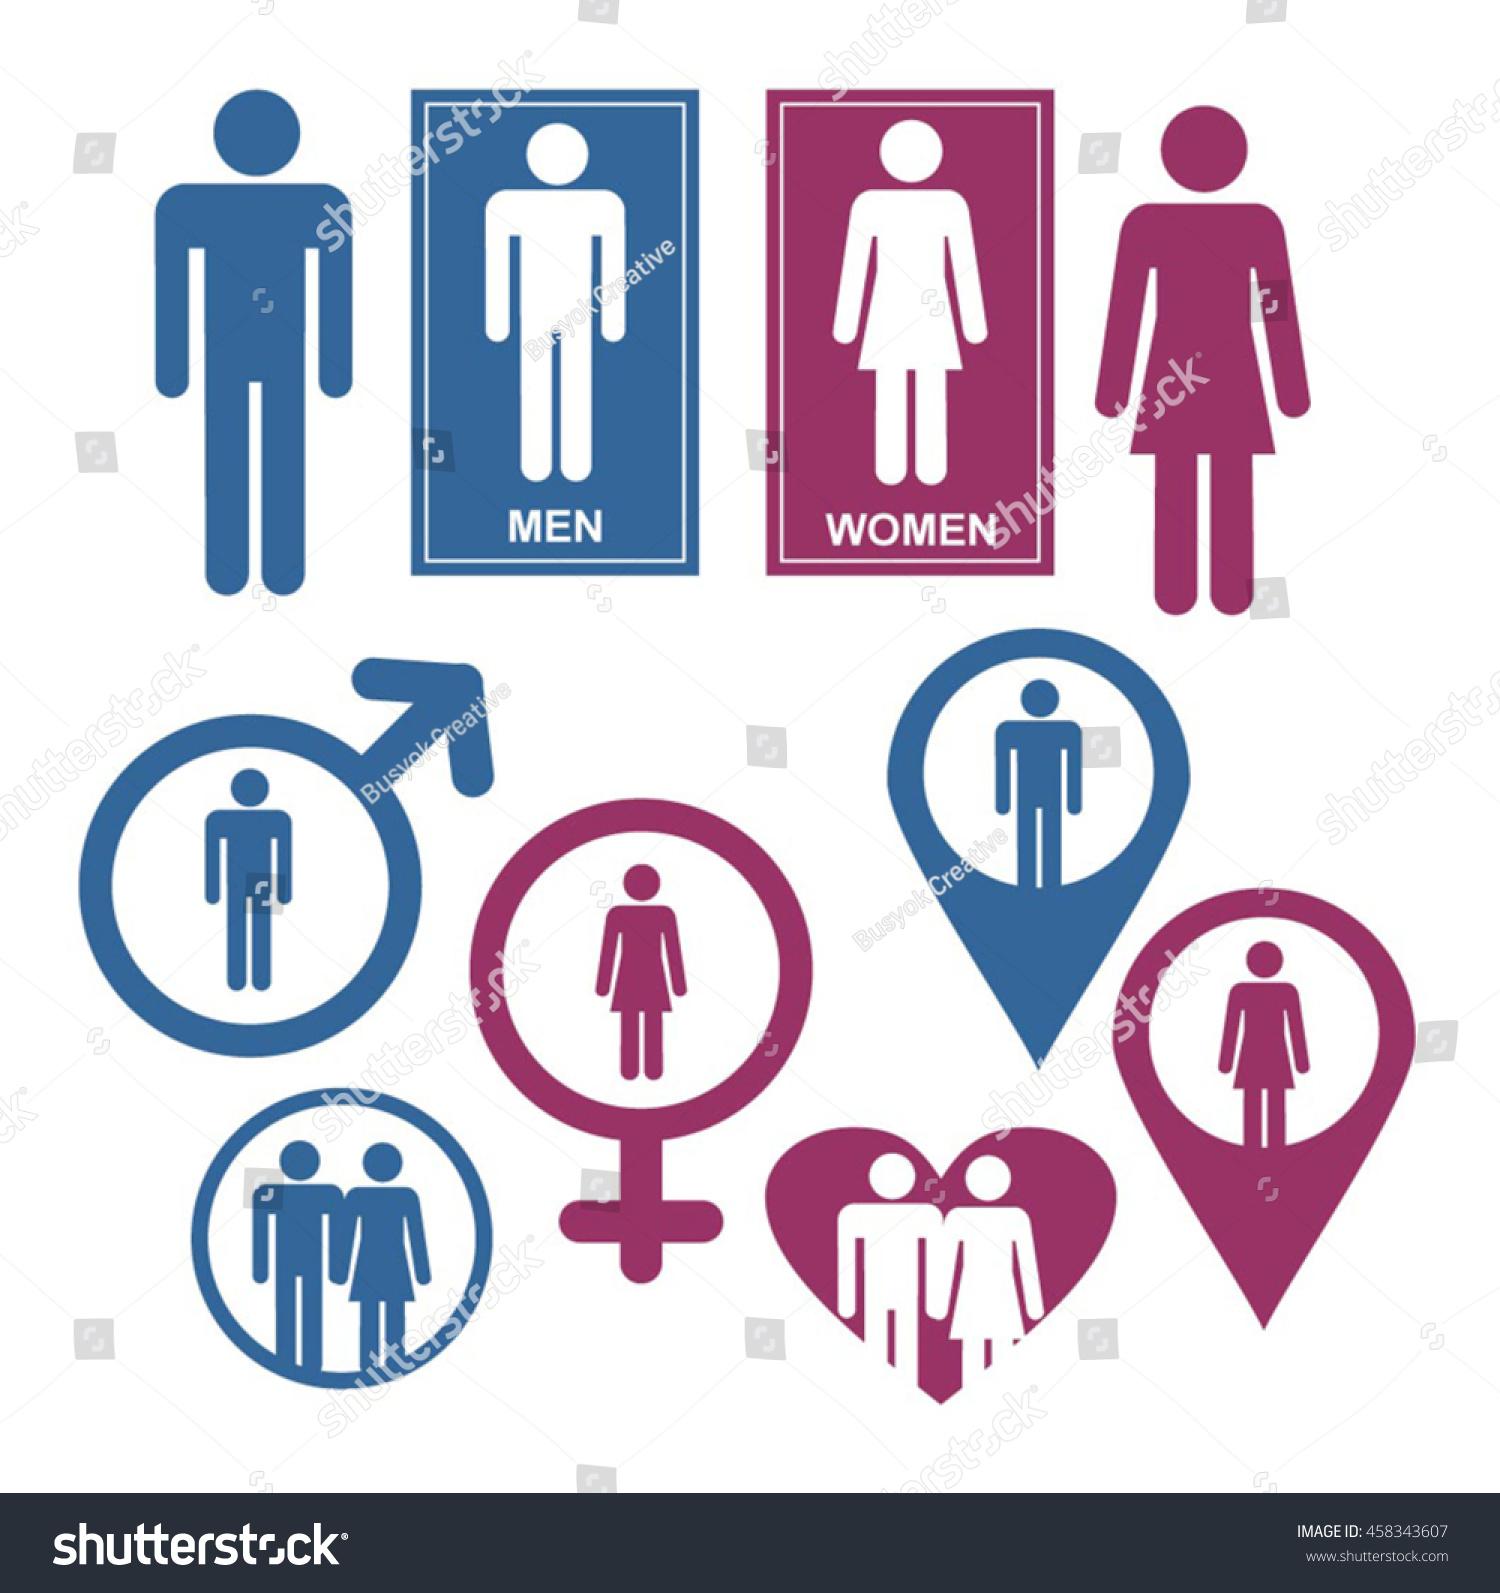 Men and women gender signs and design elements vector set